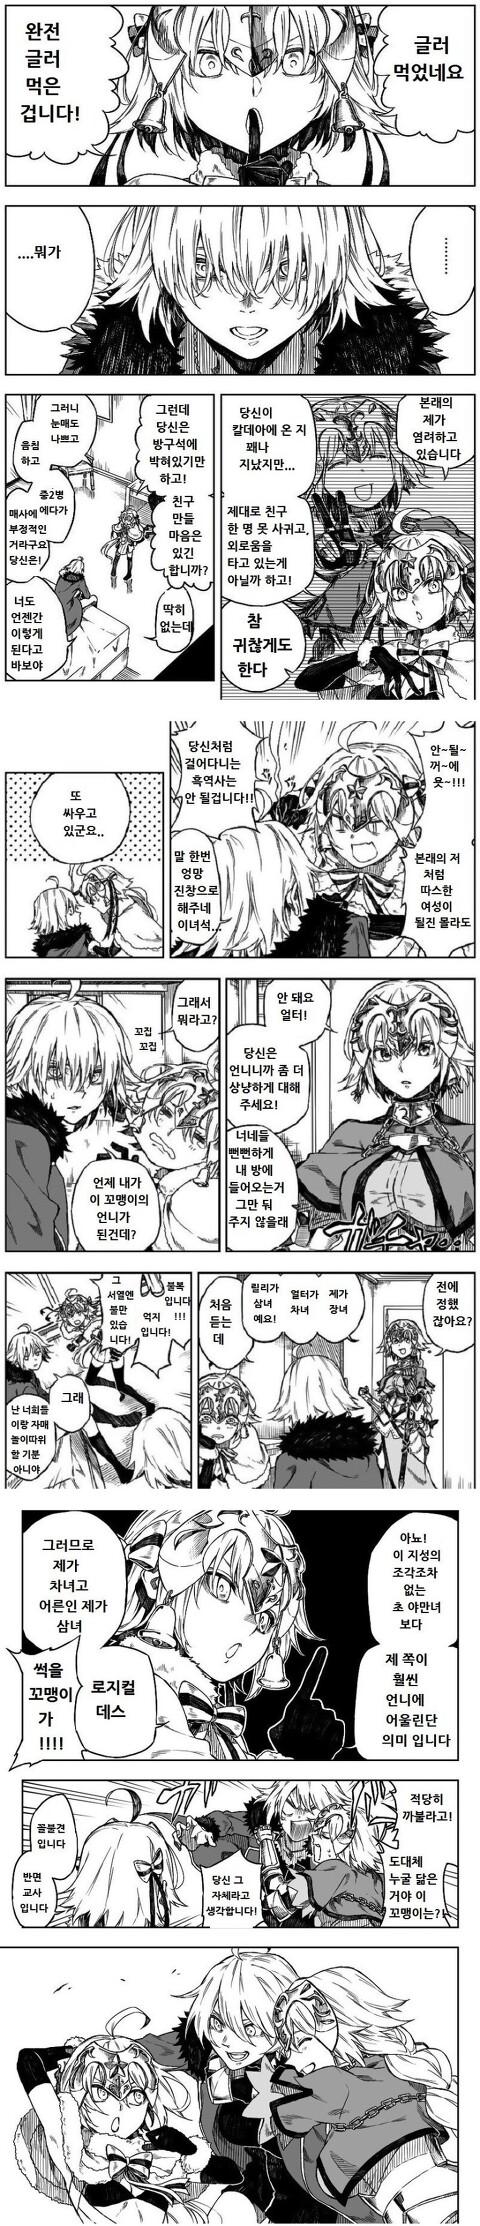 fgo) 장녀 차녀 삼녀.manga